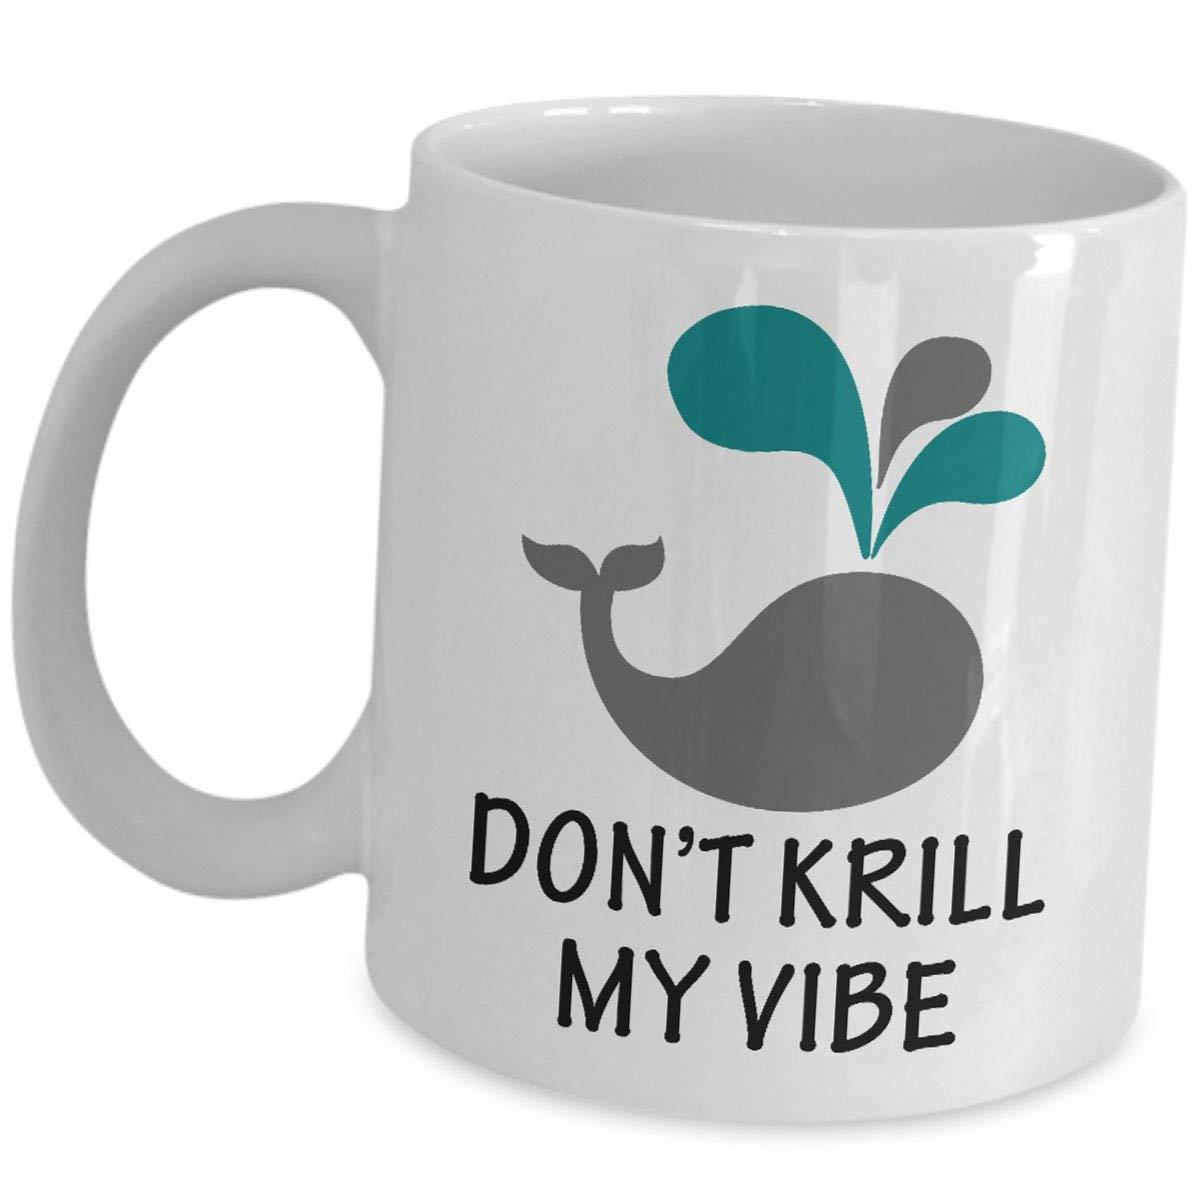 jingqi Marine Biologist Mug Coffee Tea Cup - Sea Life Biology Funny Cute Gag Graduate Student Scientist Appreciation Enthusiasts Gifts for Teens Adults - Dont Krill My Vibe